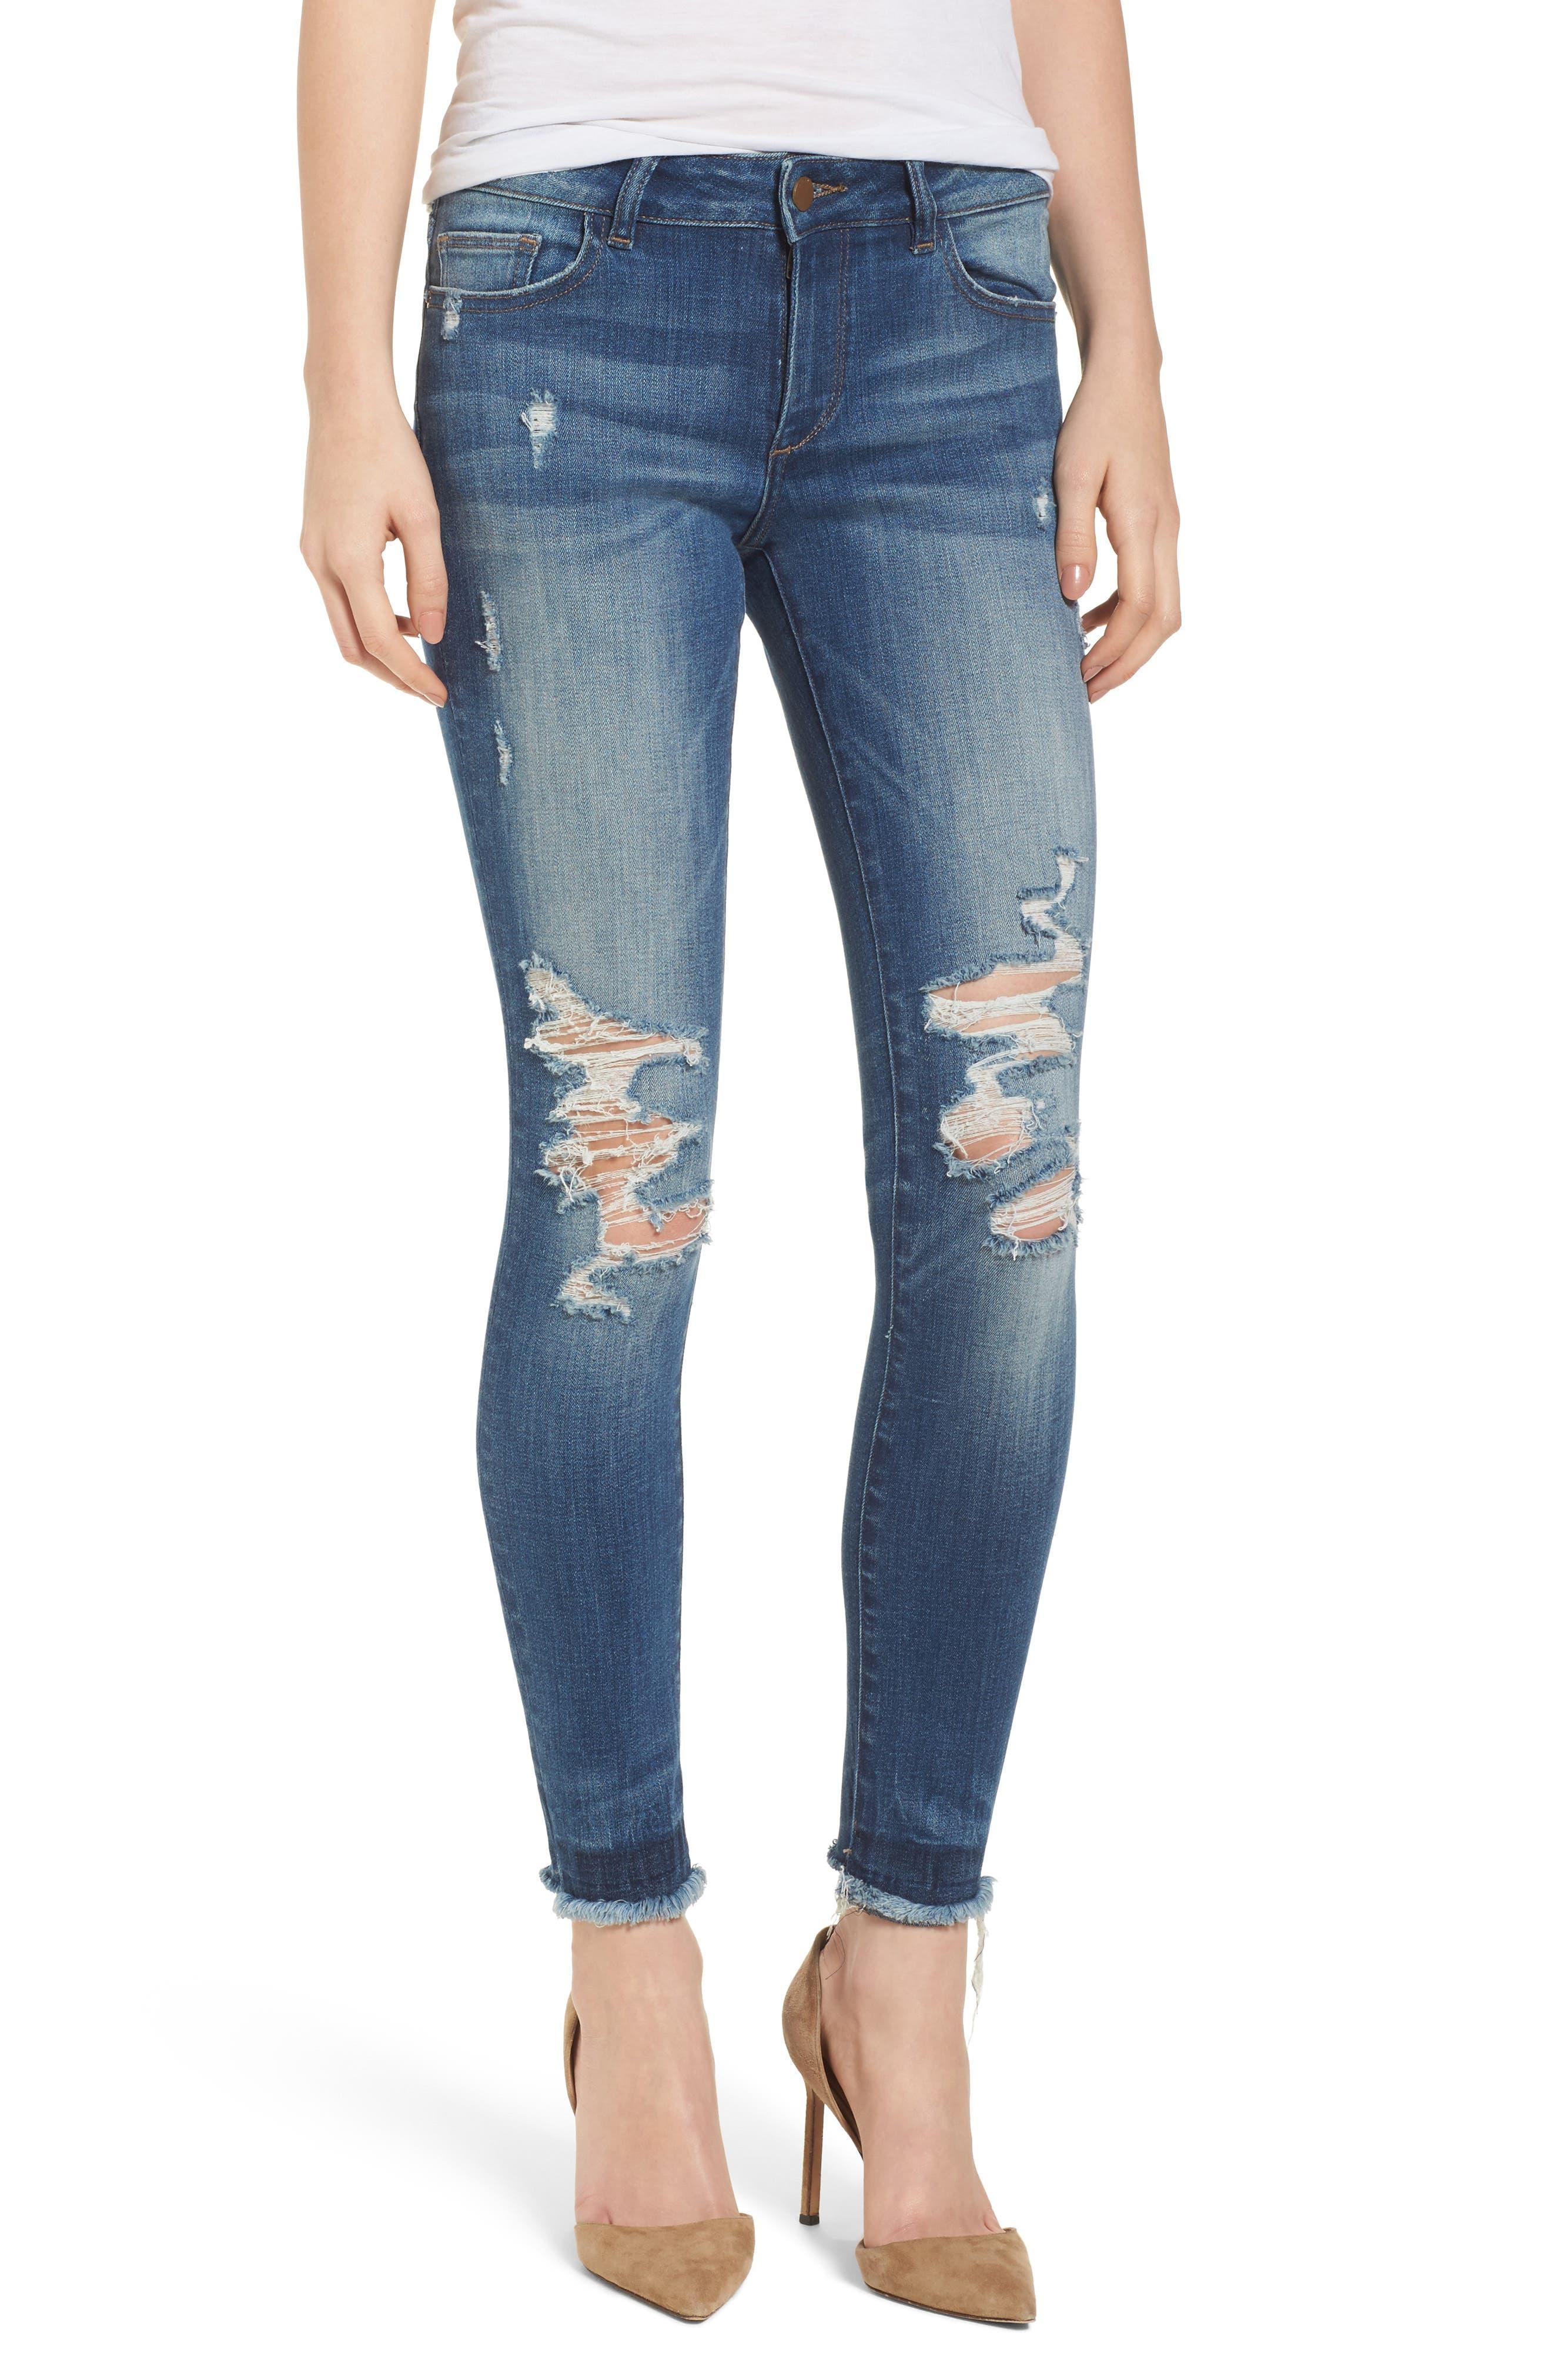 Emma Power Legging Jeans,                             Main thumbnail 1, color,                             425